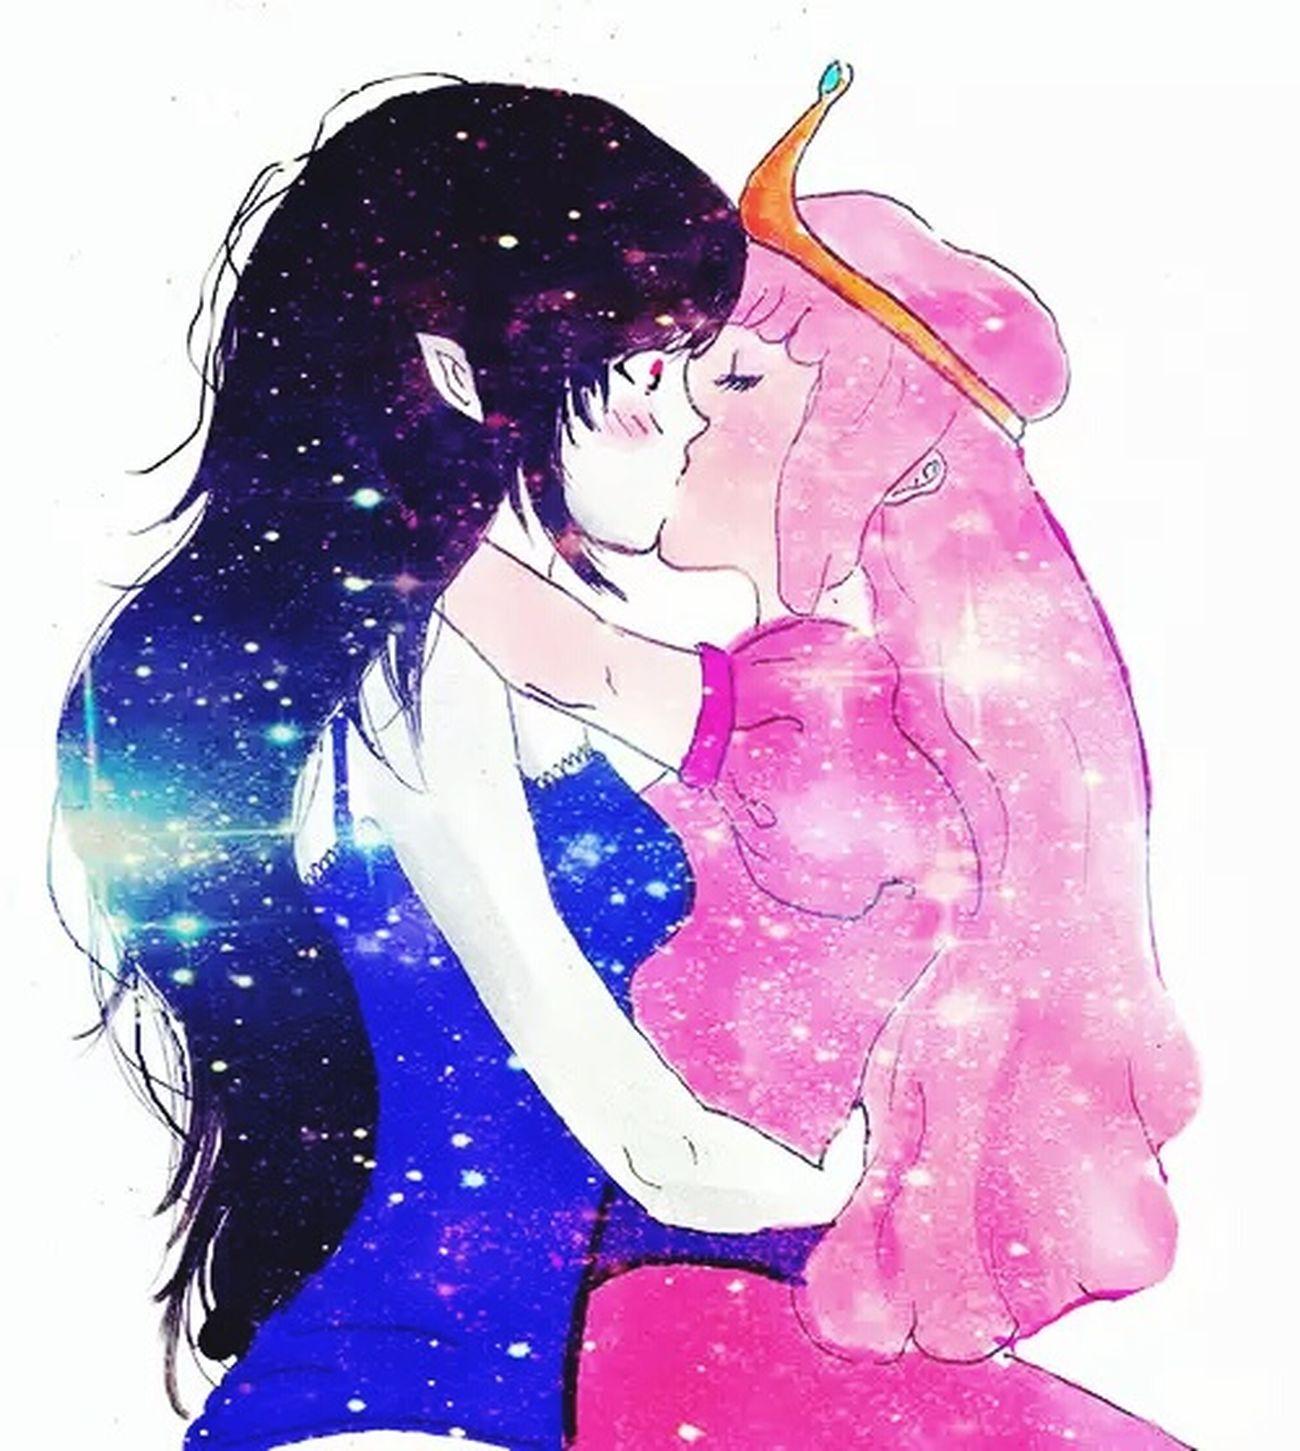 I and my Girlfriend 😍😍😍😍😍😍 Girlfriend My Baby Girl <3 Brie❤